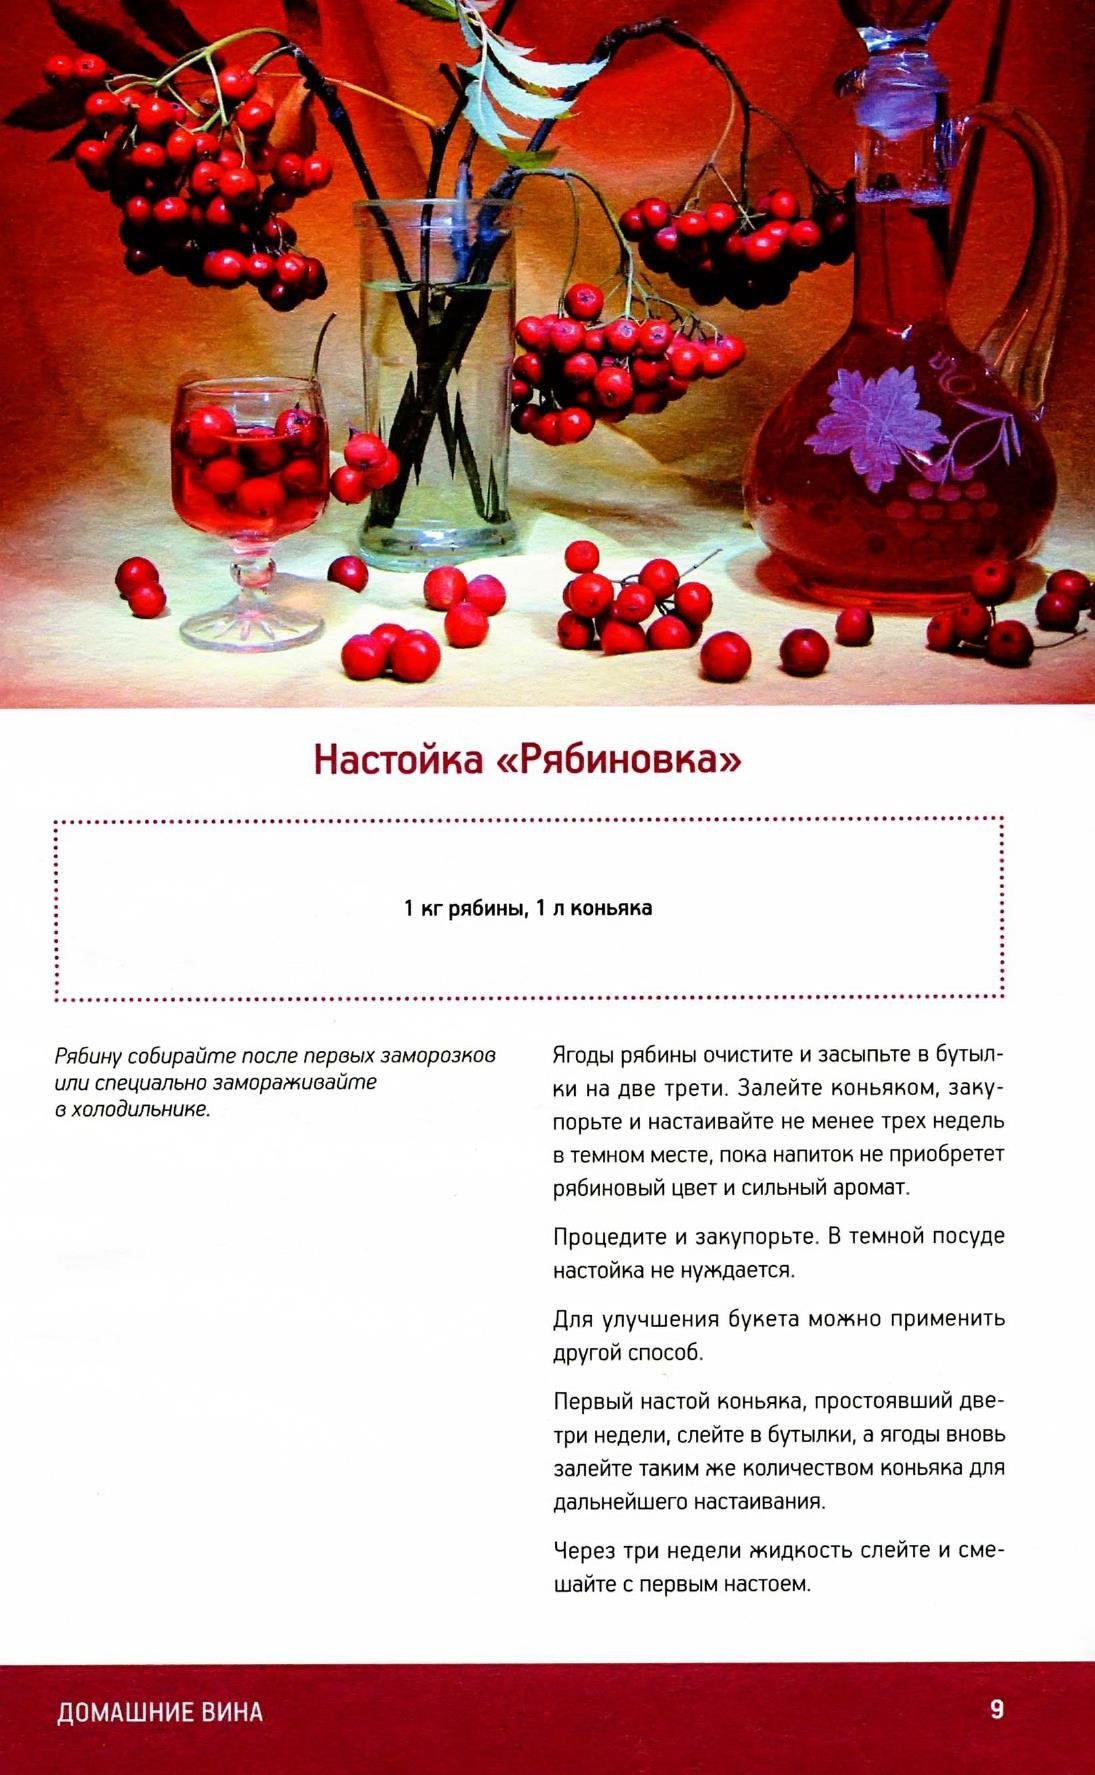 http://images.vfl.ru/ii/1407525362/f7c9fd44/5940195.jpg